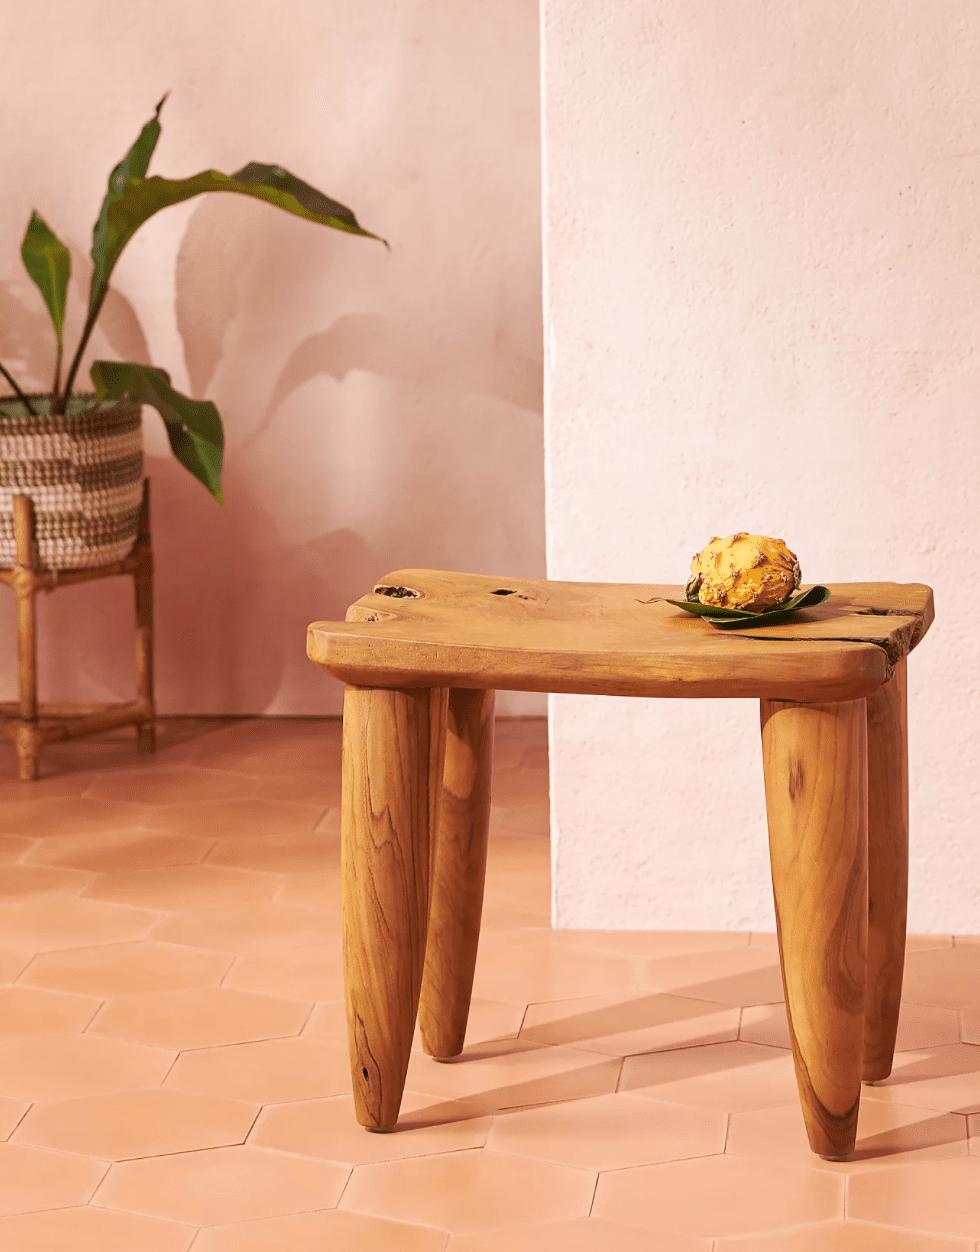 A small wooden bath stool